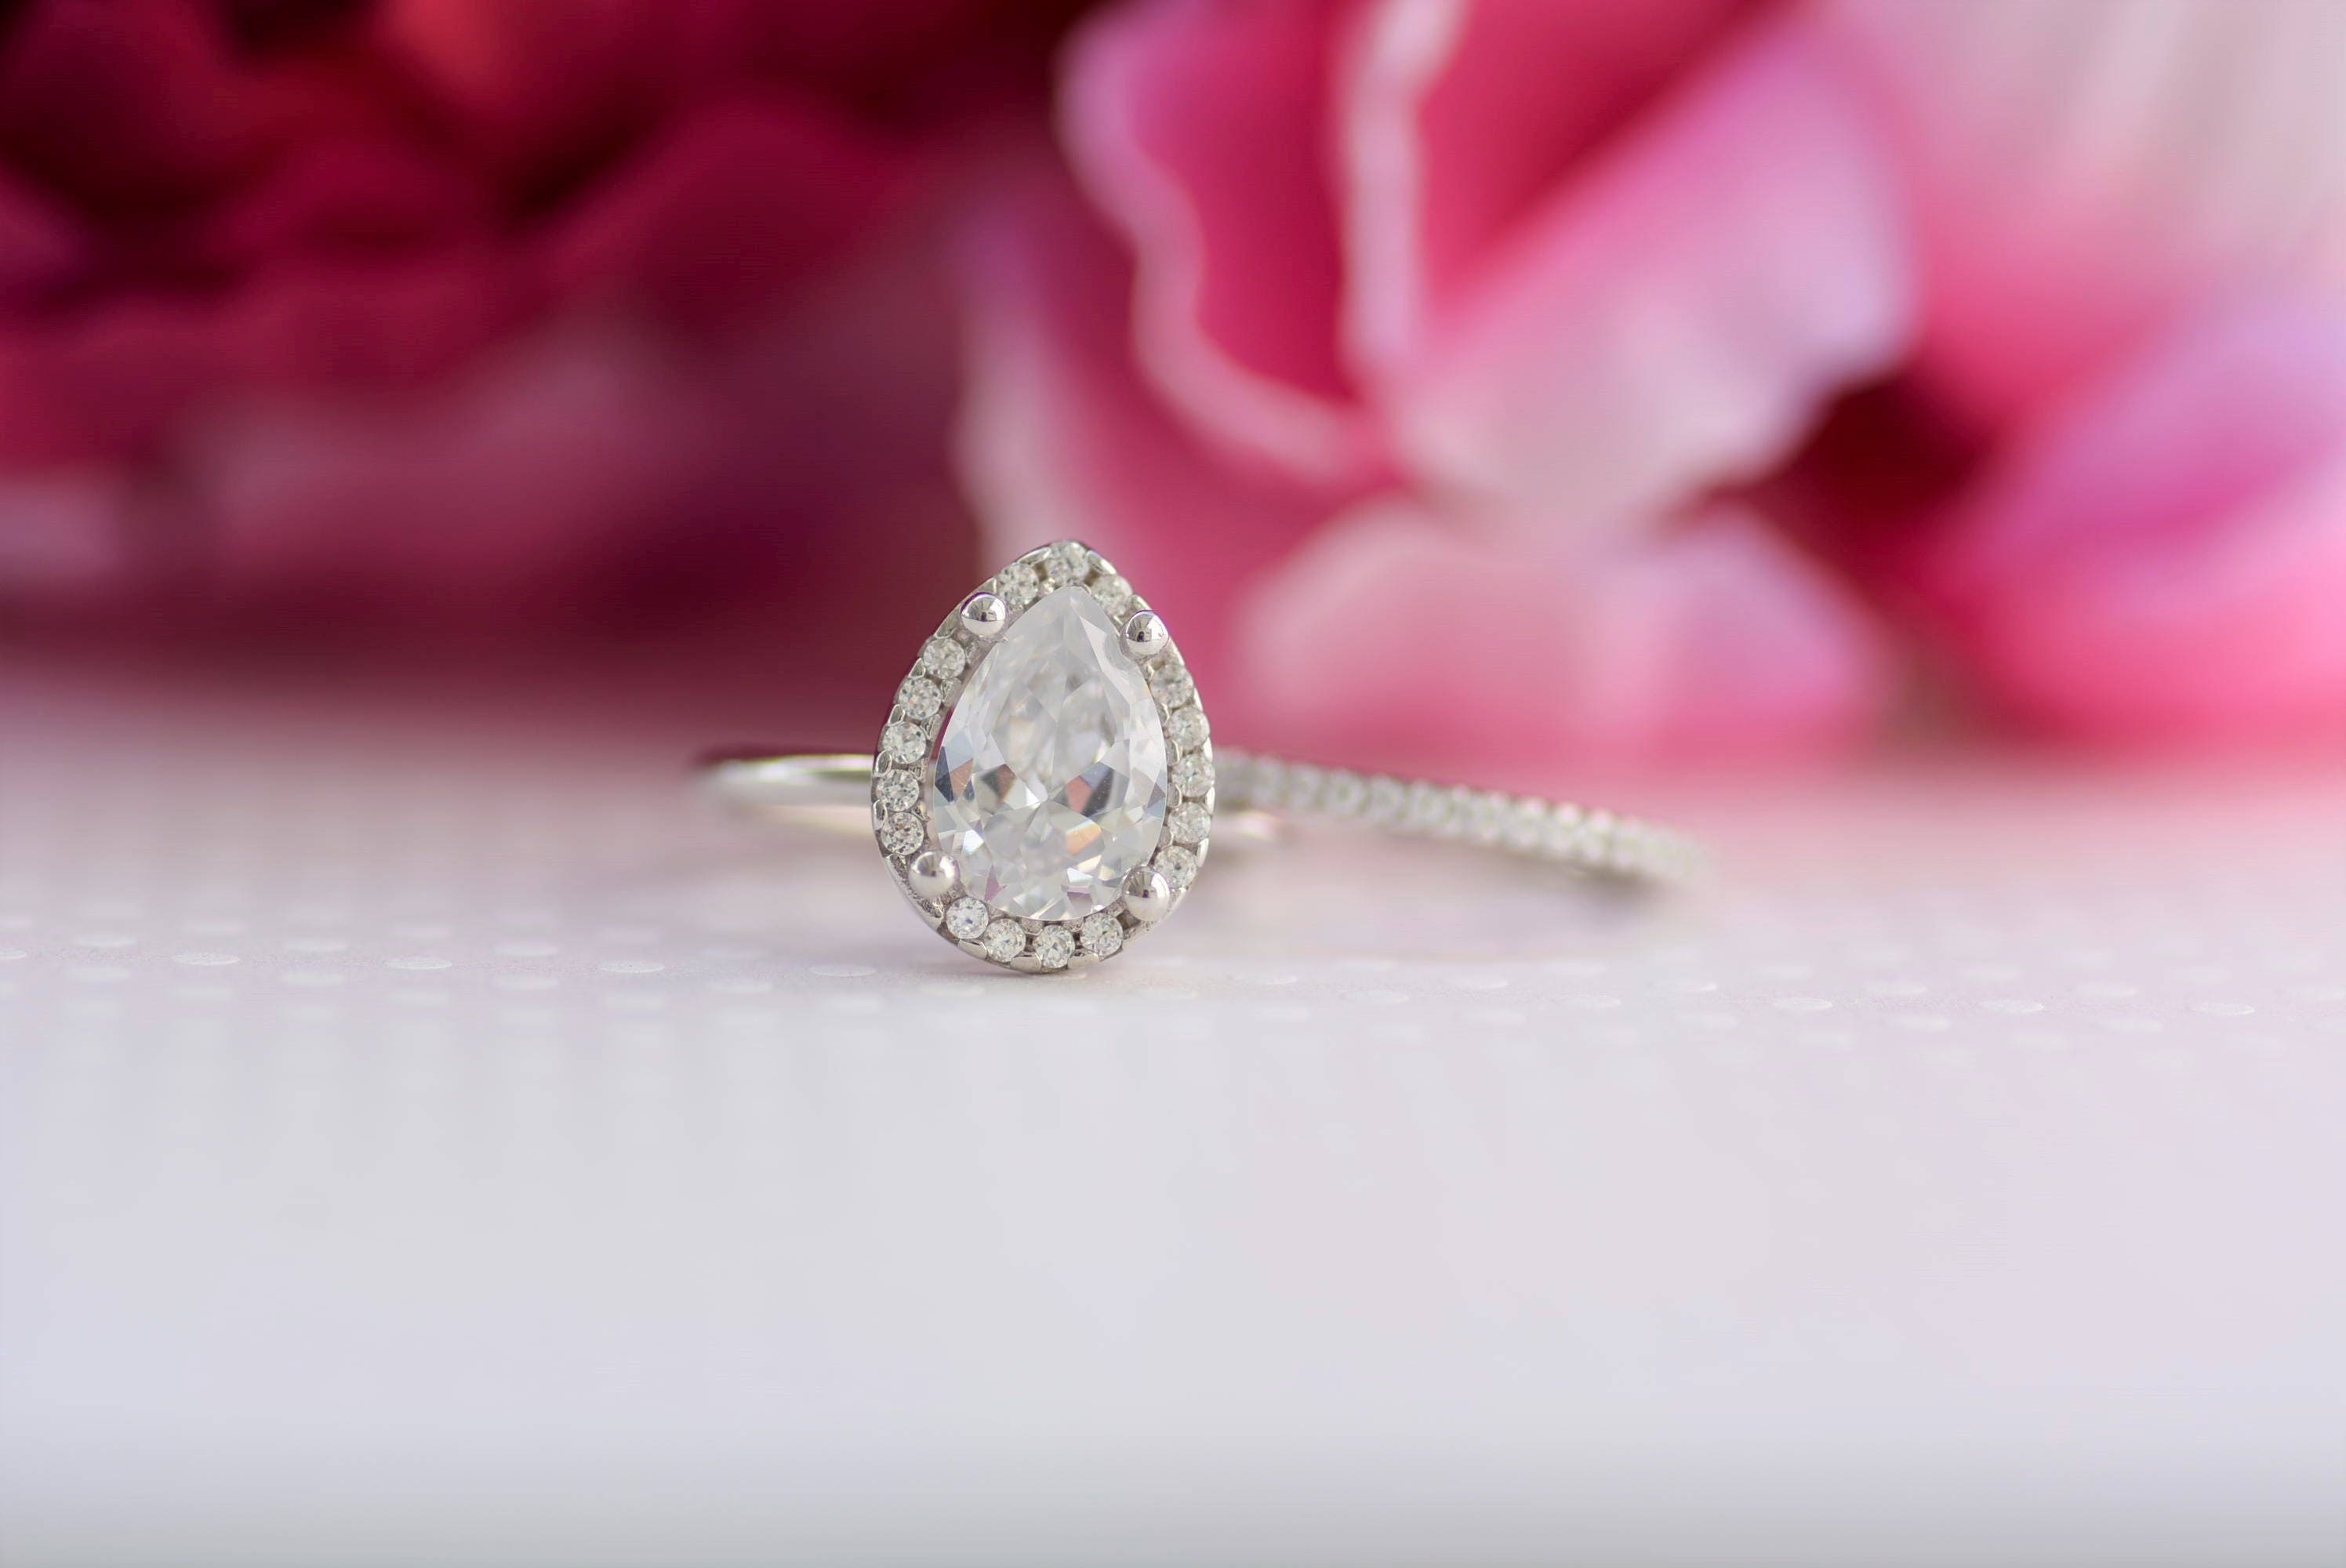 New Nickel Free Wedding Ring Set – Wedding